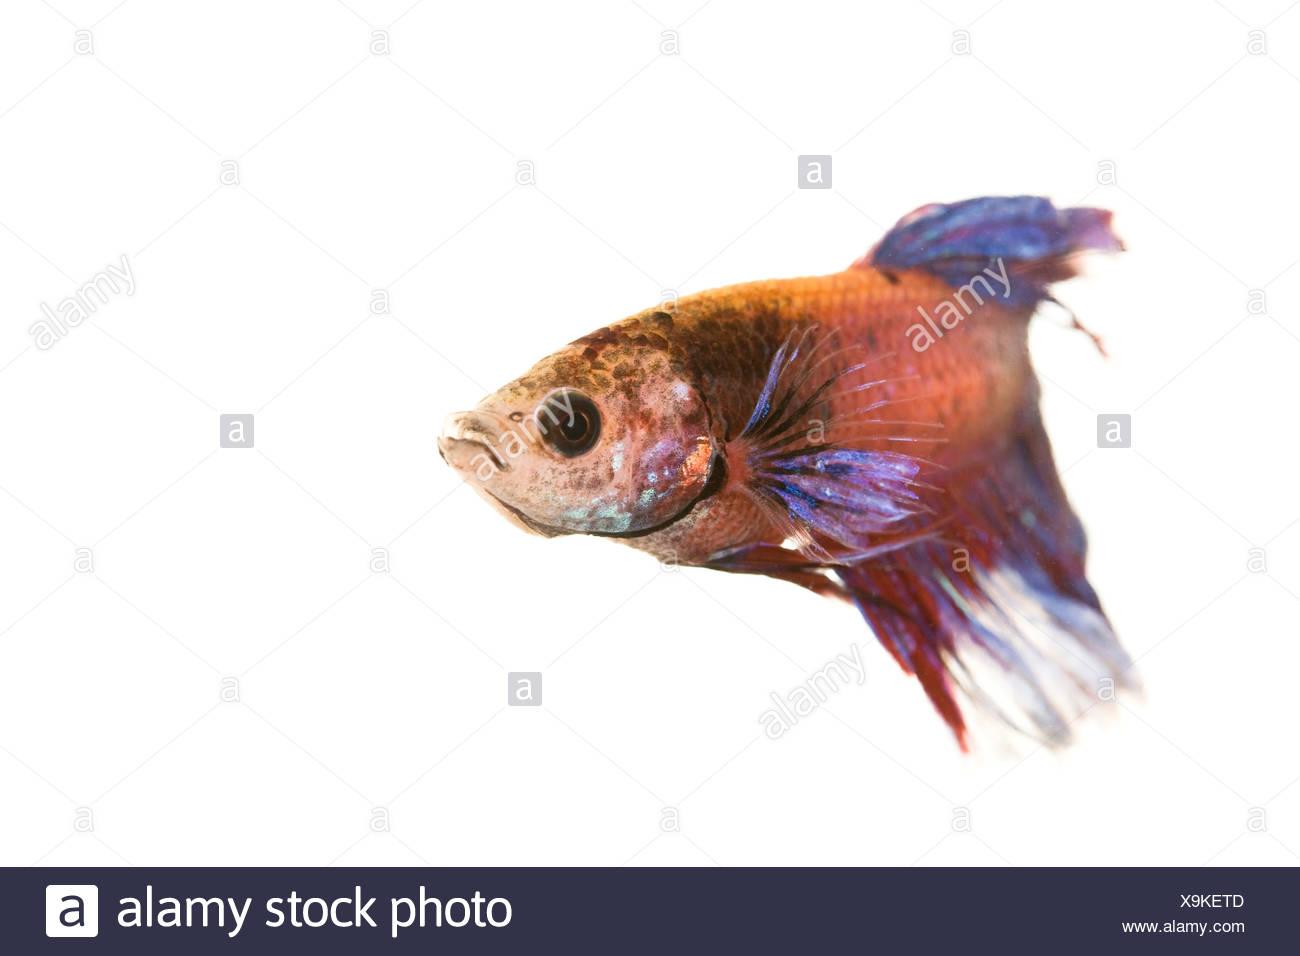 Siamese Fighting Fish, male (Betta splendens) - Stock Image